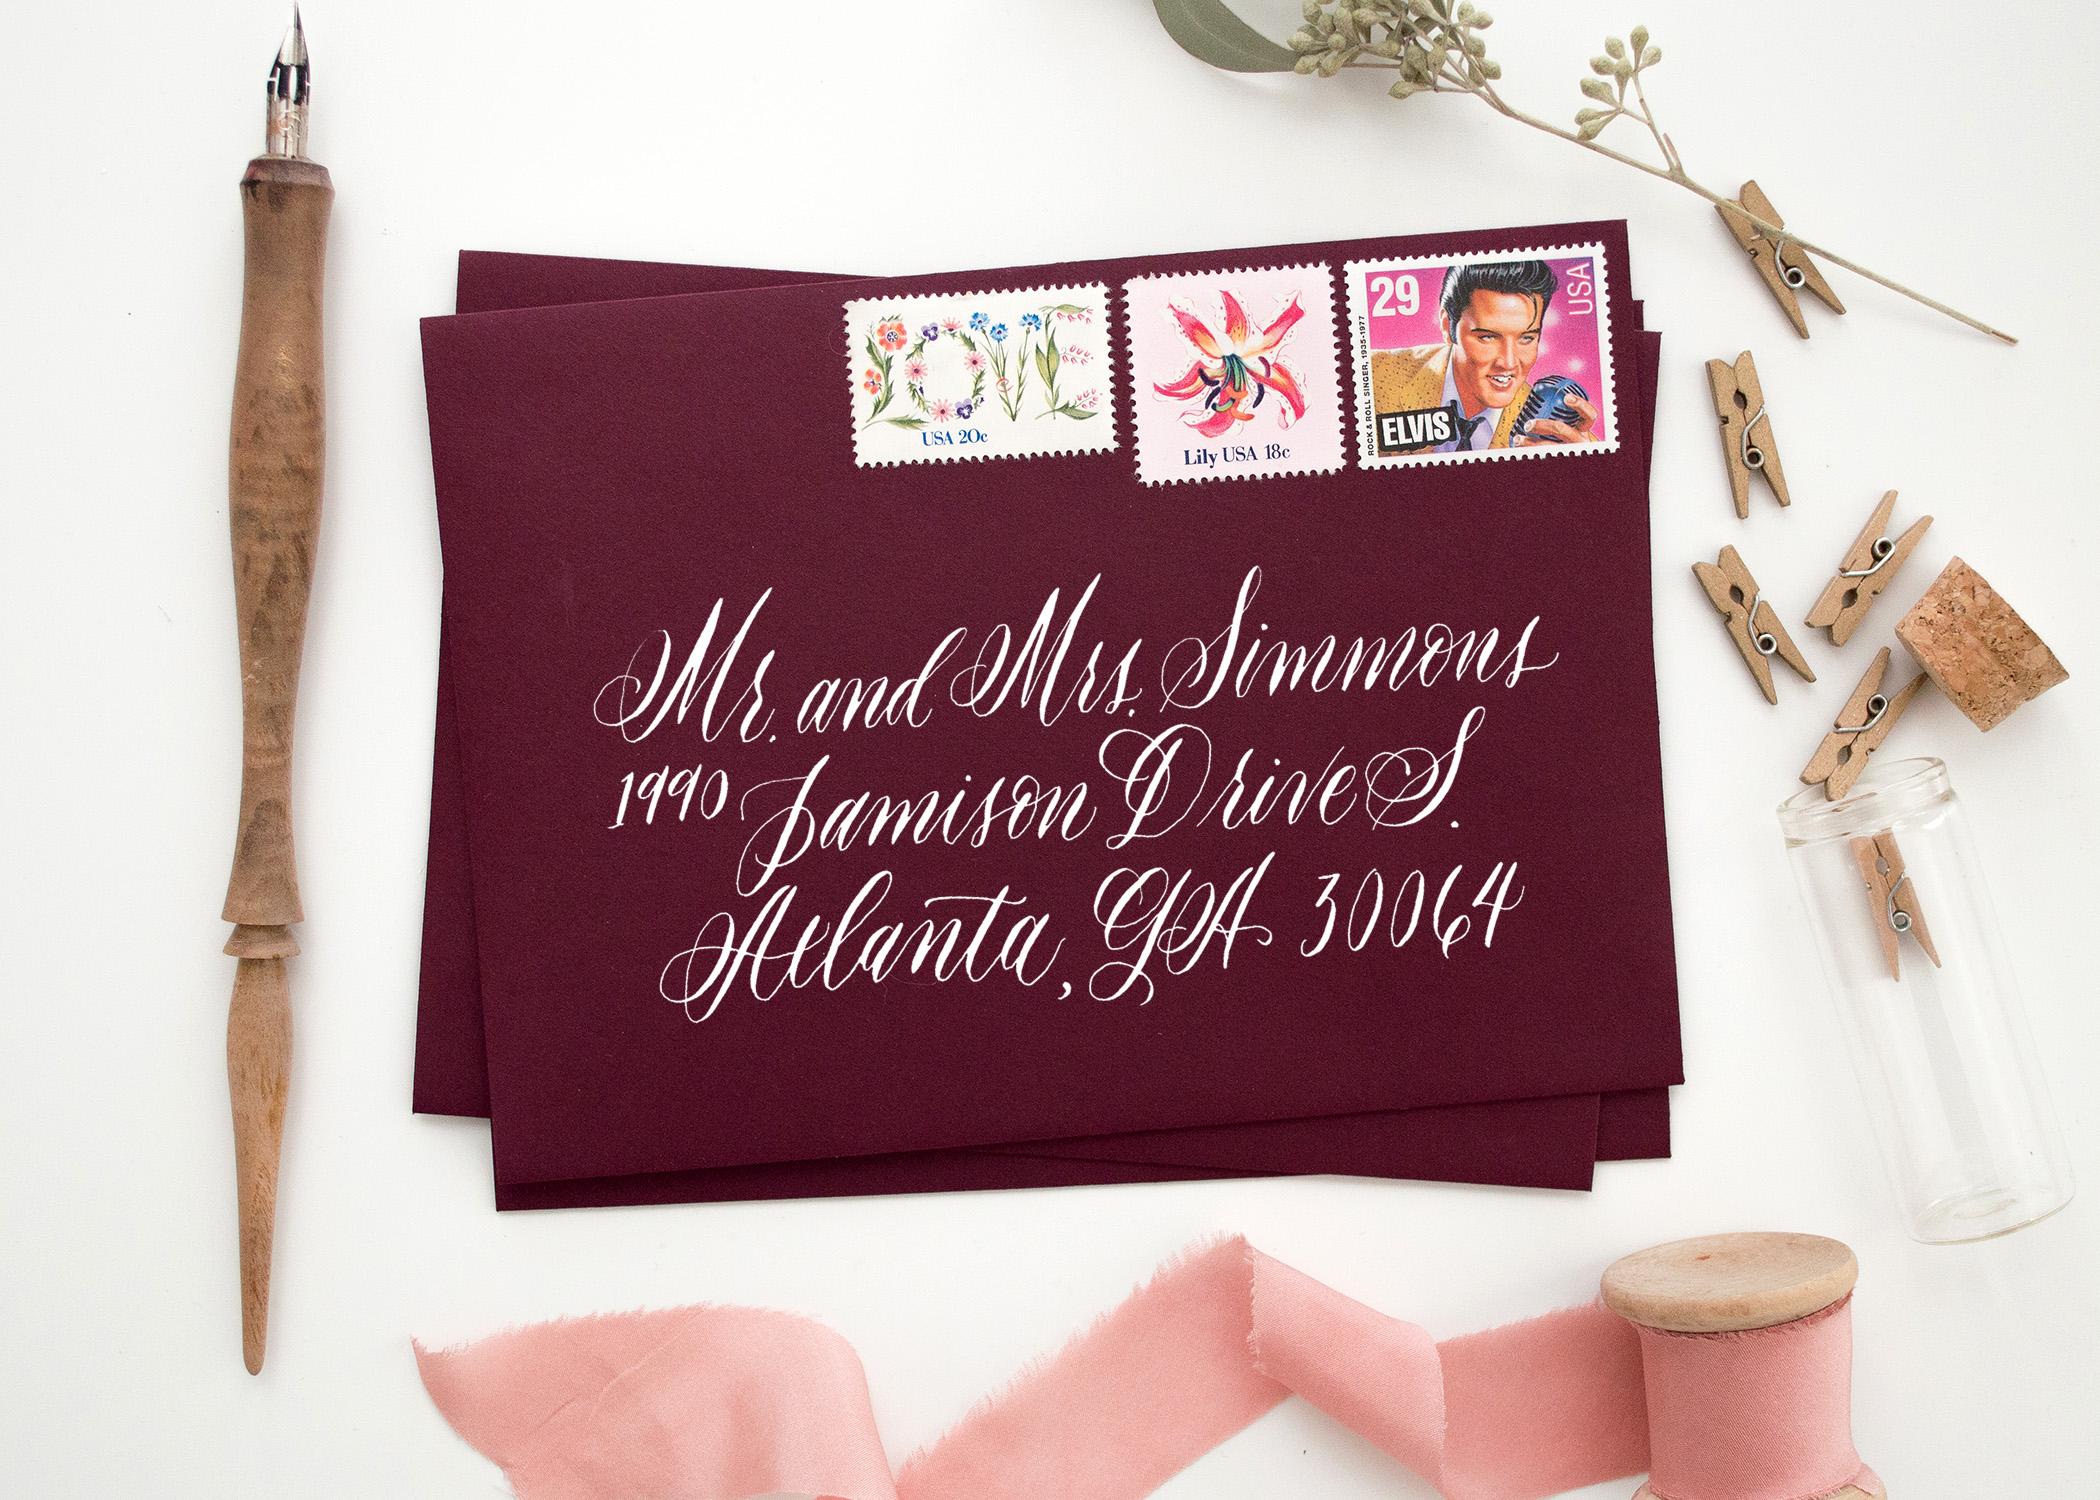 atlanta calligraphy, atlanta calligrapher, marietta calligraphy, marietta calligrapher, envelope addressing georgia